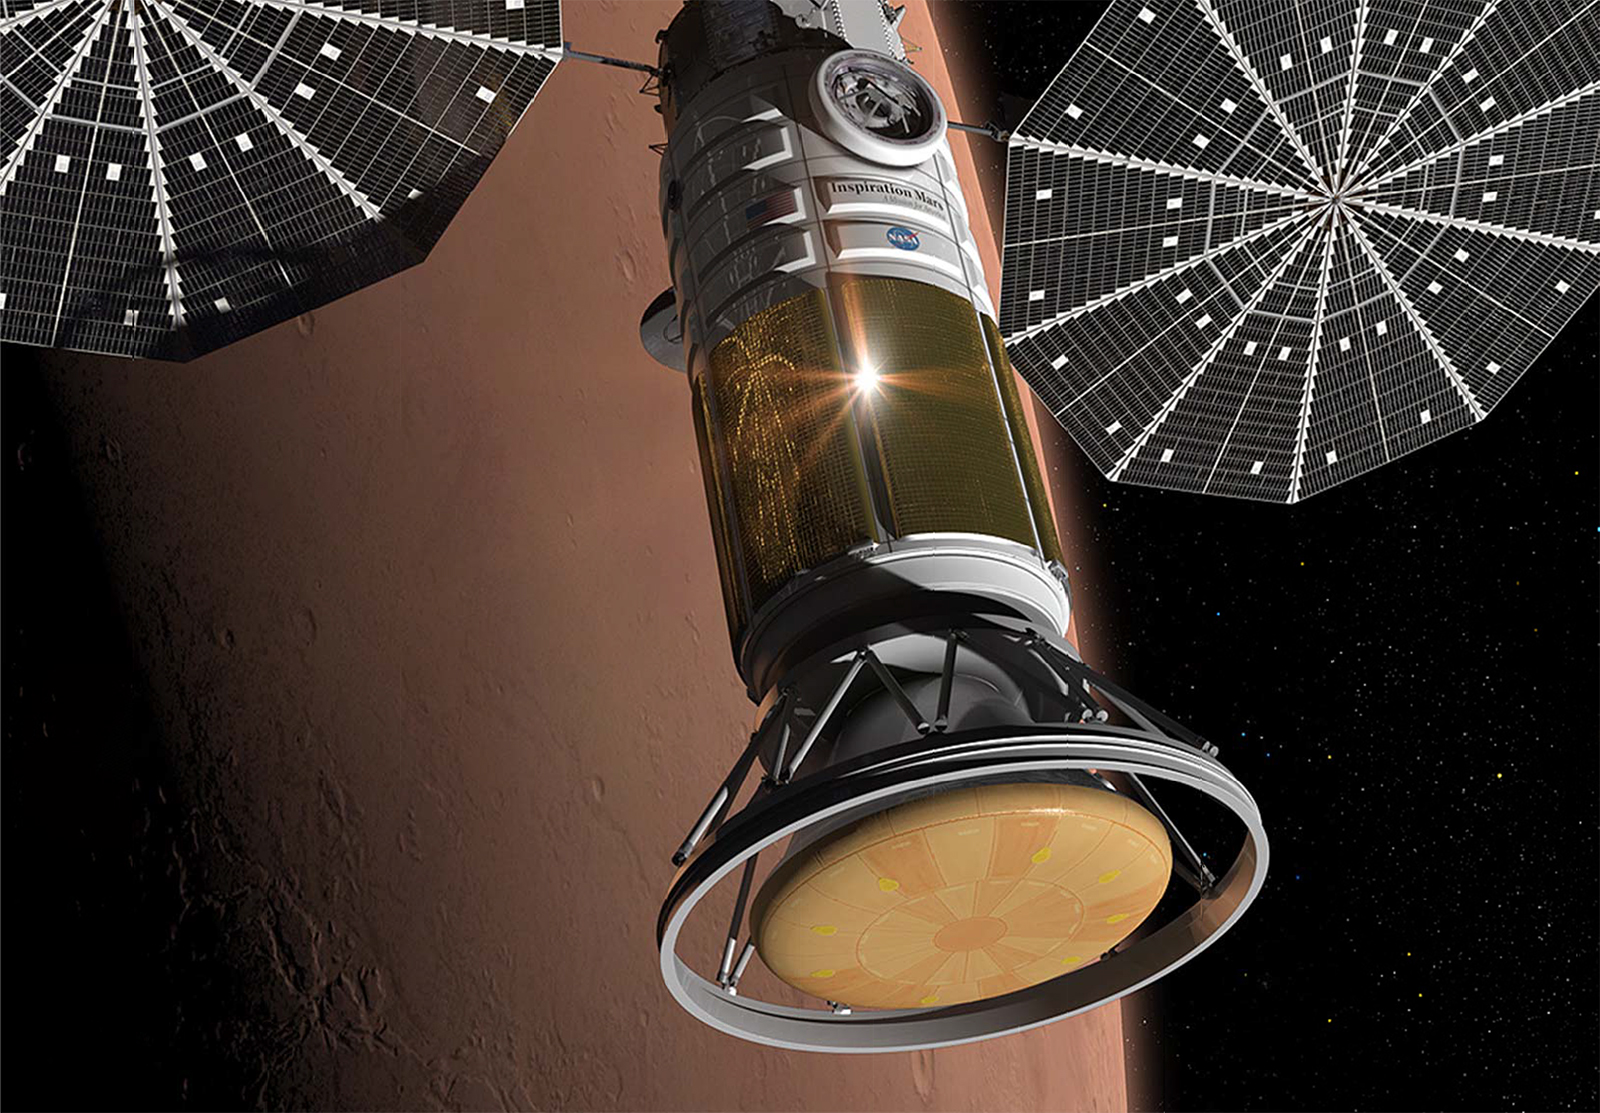 spacecraft sent to mars - photo #11